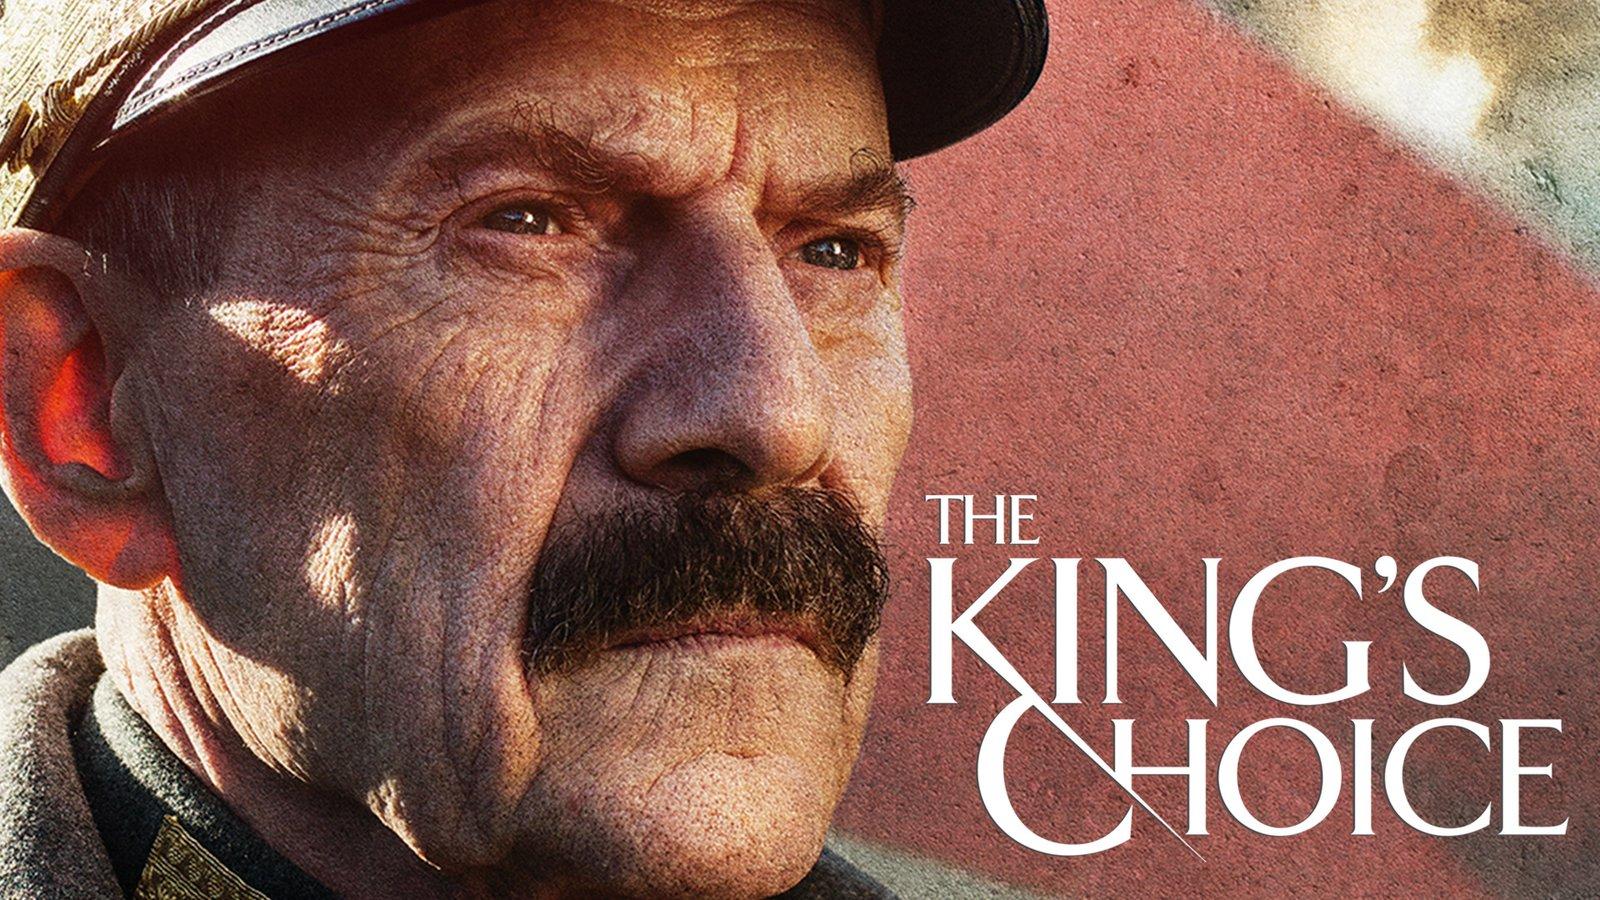 The King's Choice - Kongens nei